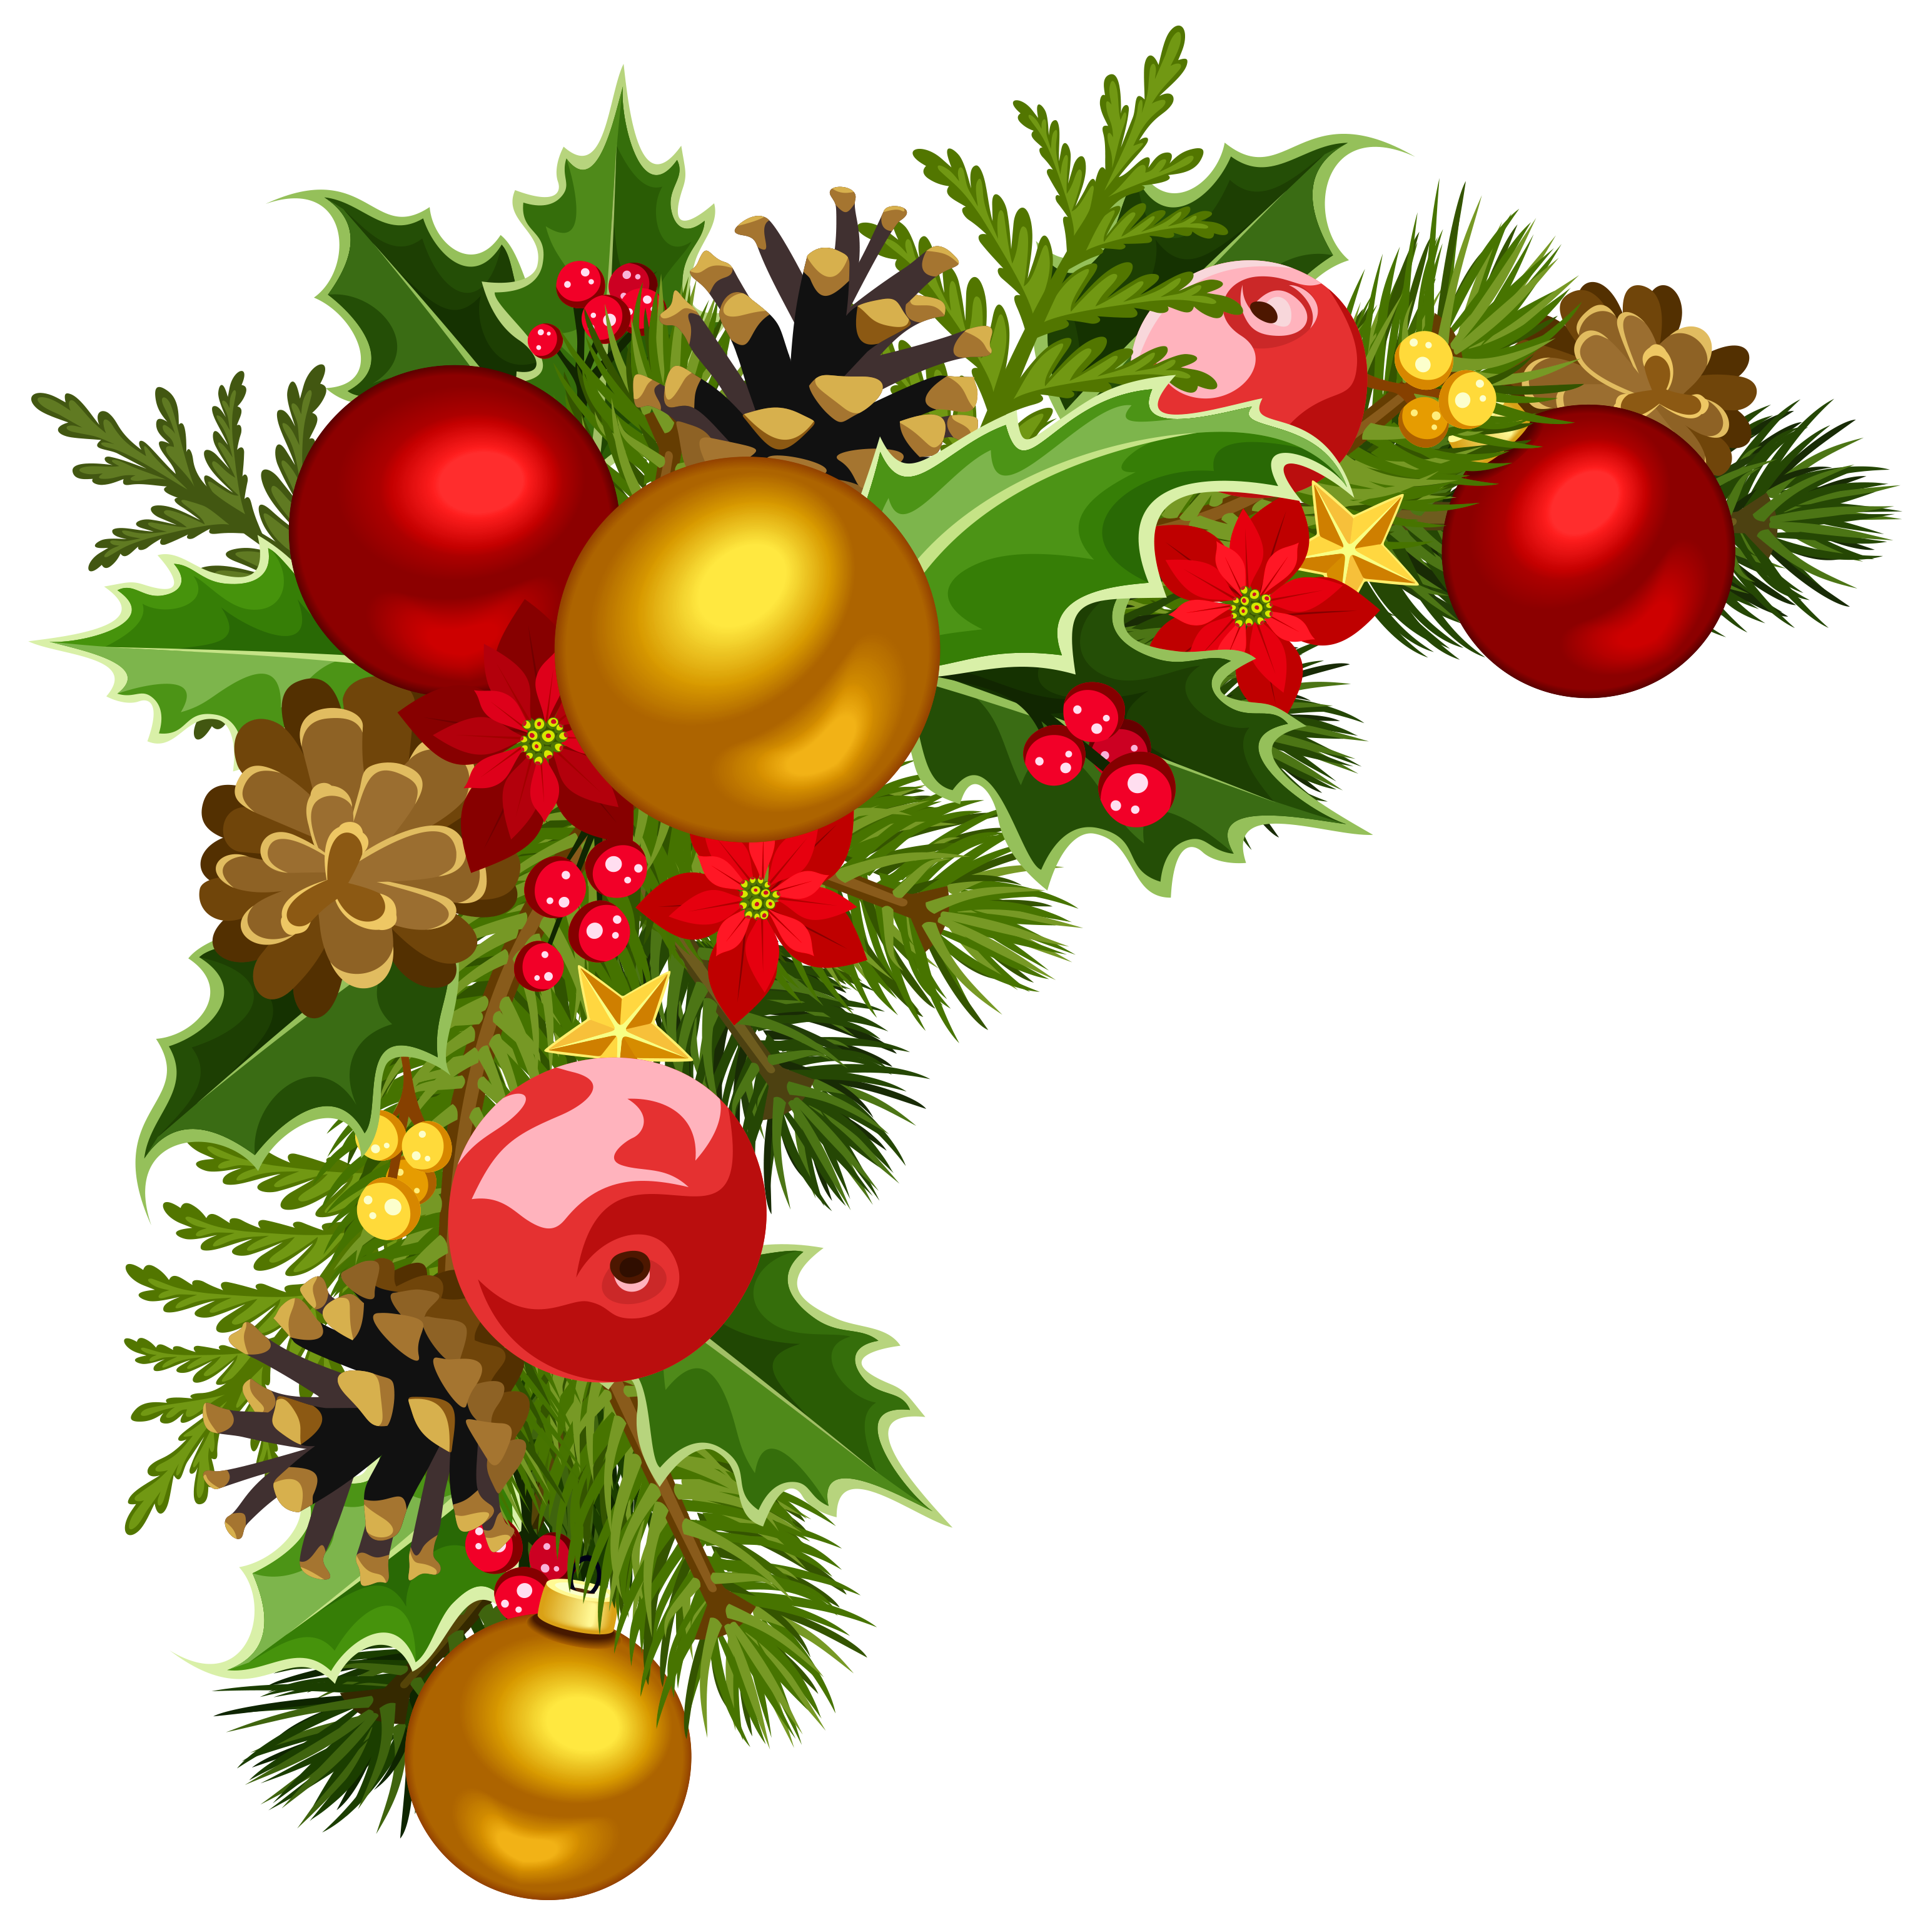 jpg Christmas clipart corner borders. Deco with tree decorations